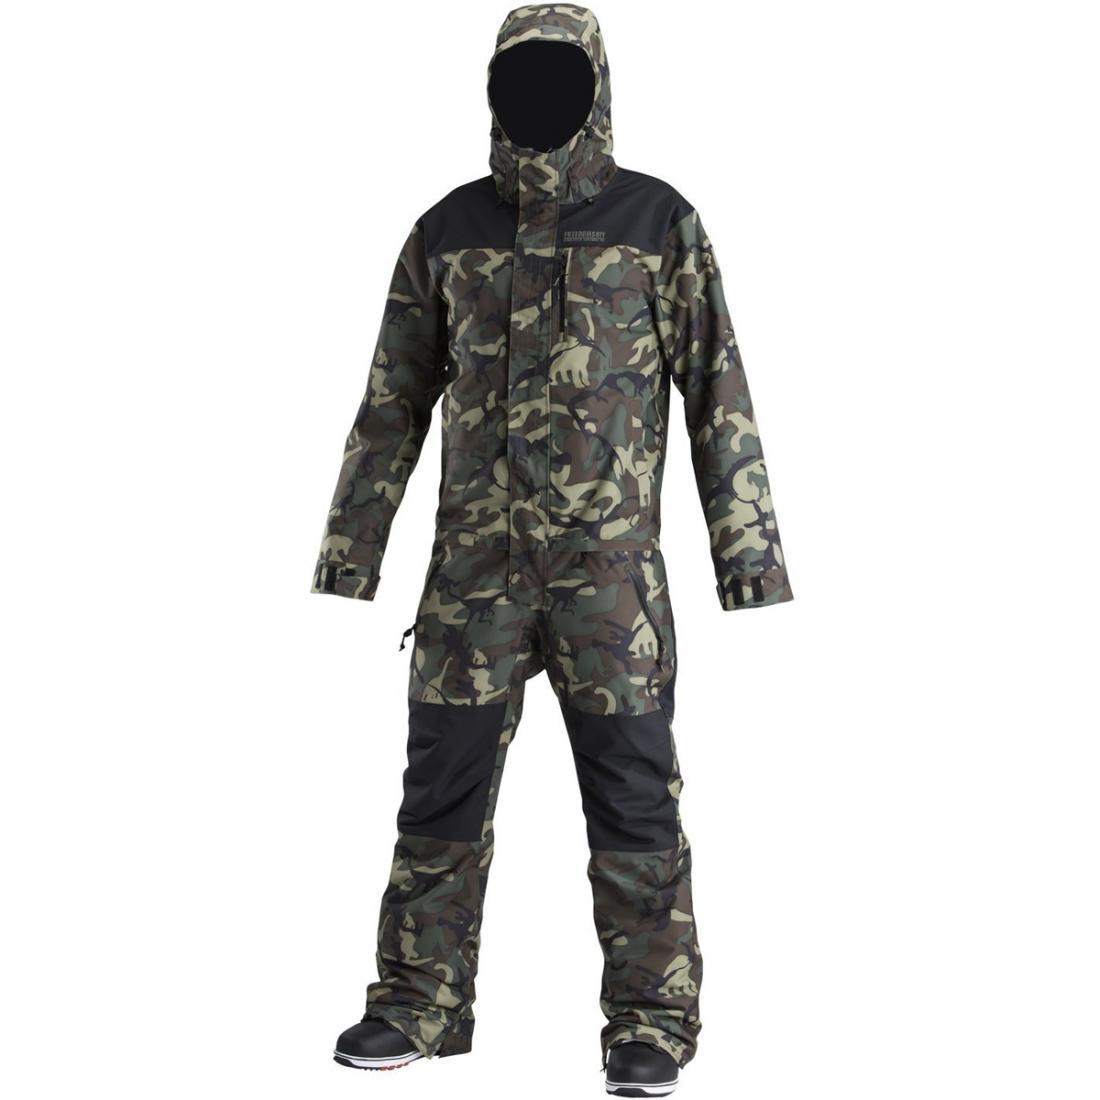 Сноубордический комбинезон Airblaster Insulated Freedom Suit купить в Boardshop №1